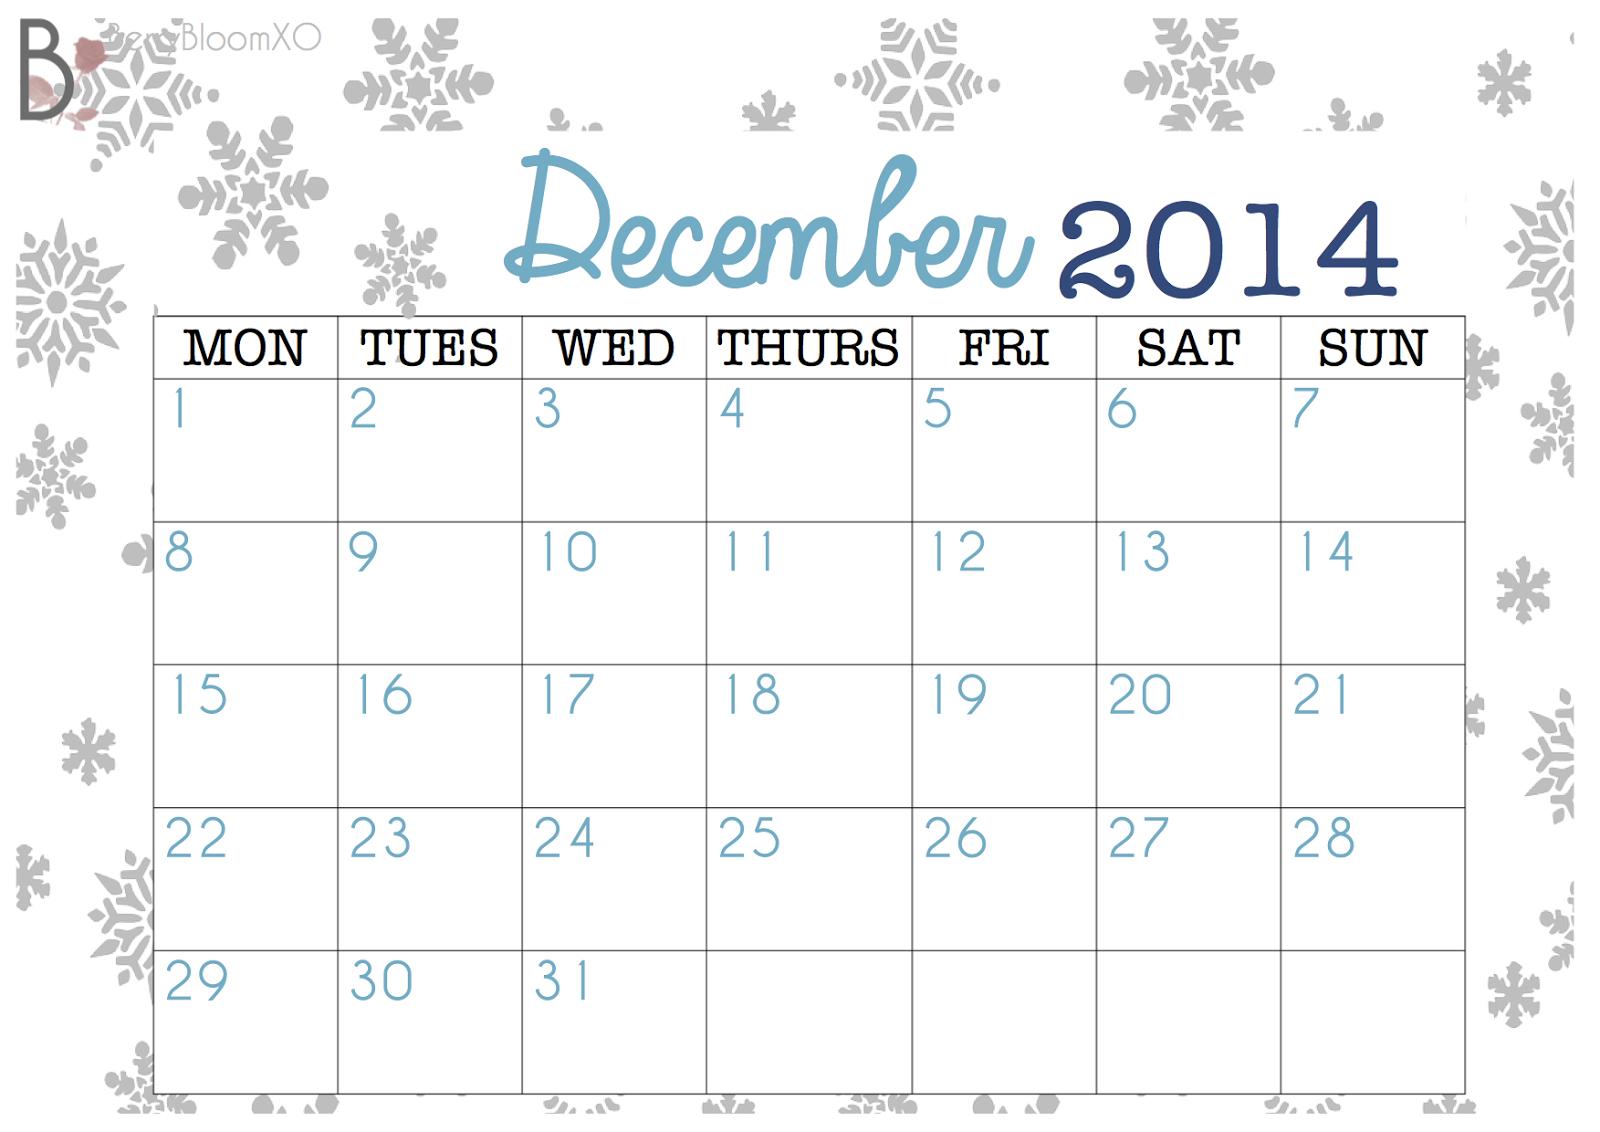 Beauty & Lifestyle Blog: December 2014 Calendar - FREE PRINTABLE